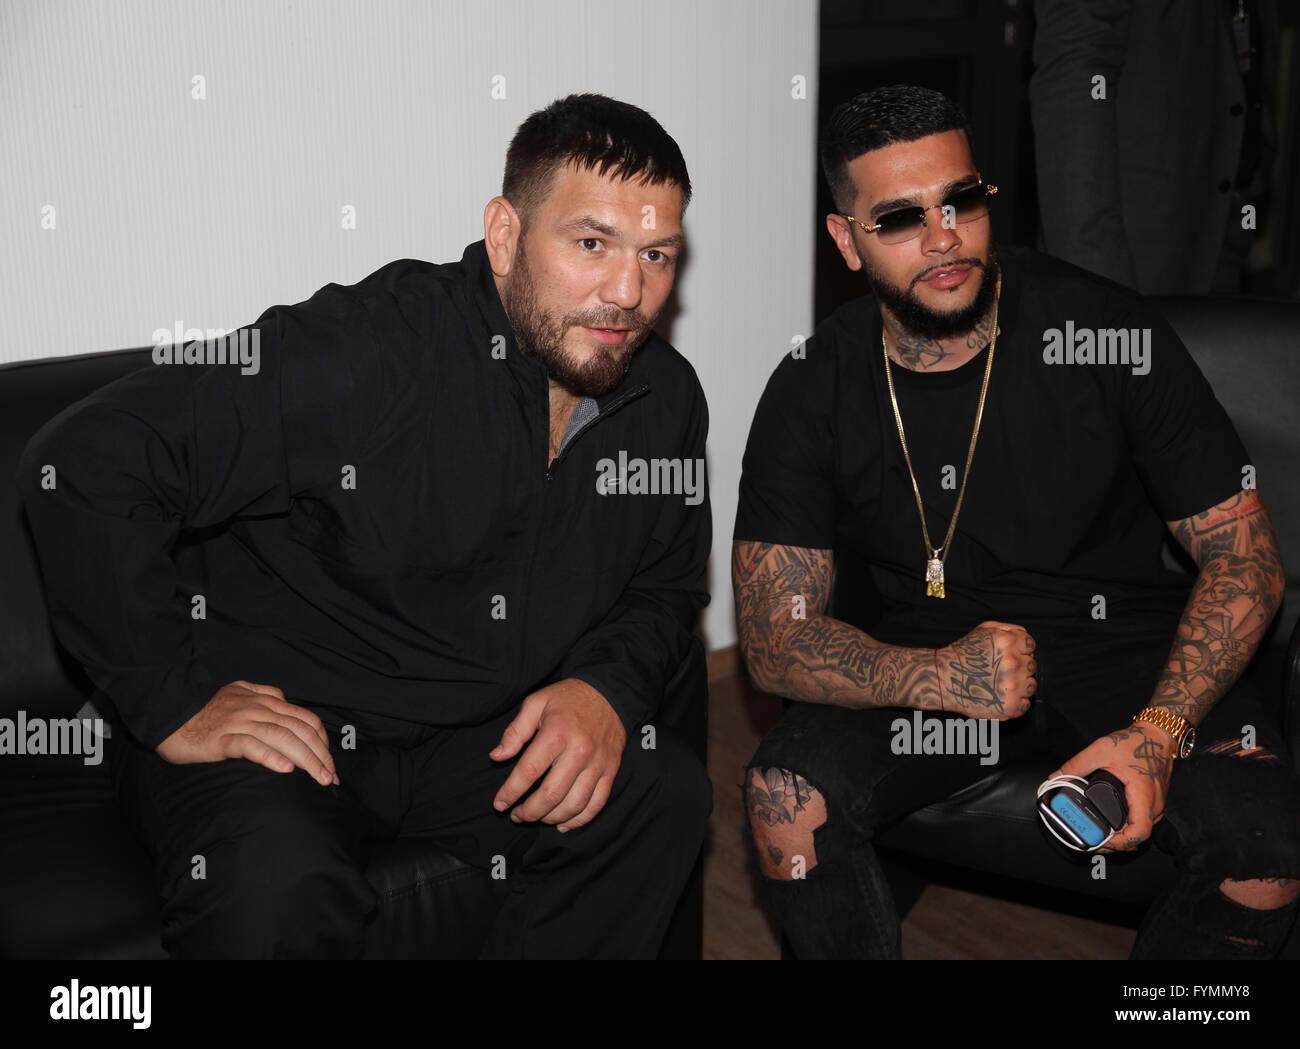 Ruslan Chagaev and Timati - Stock Image